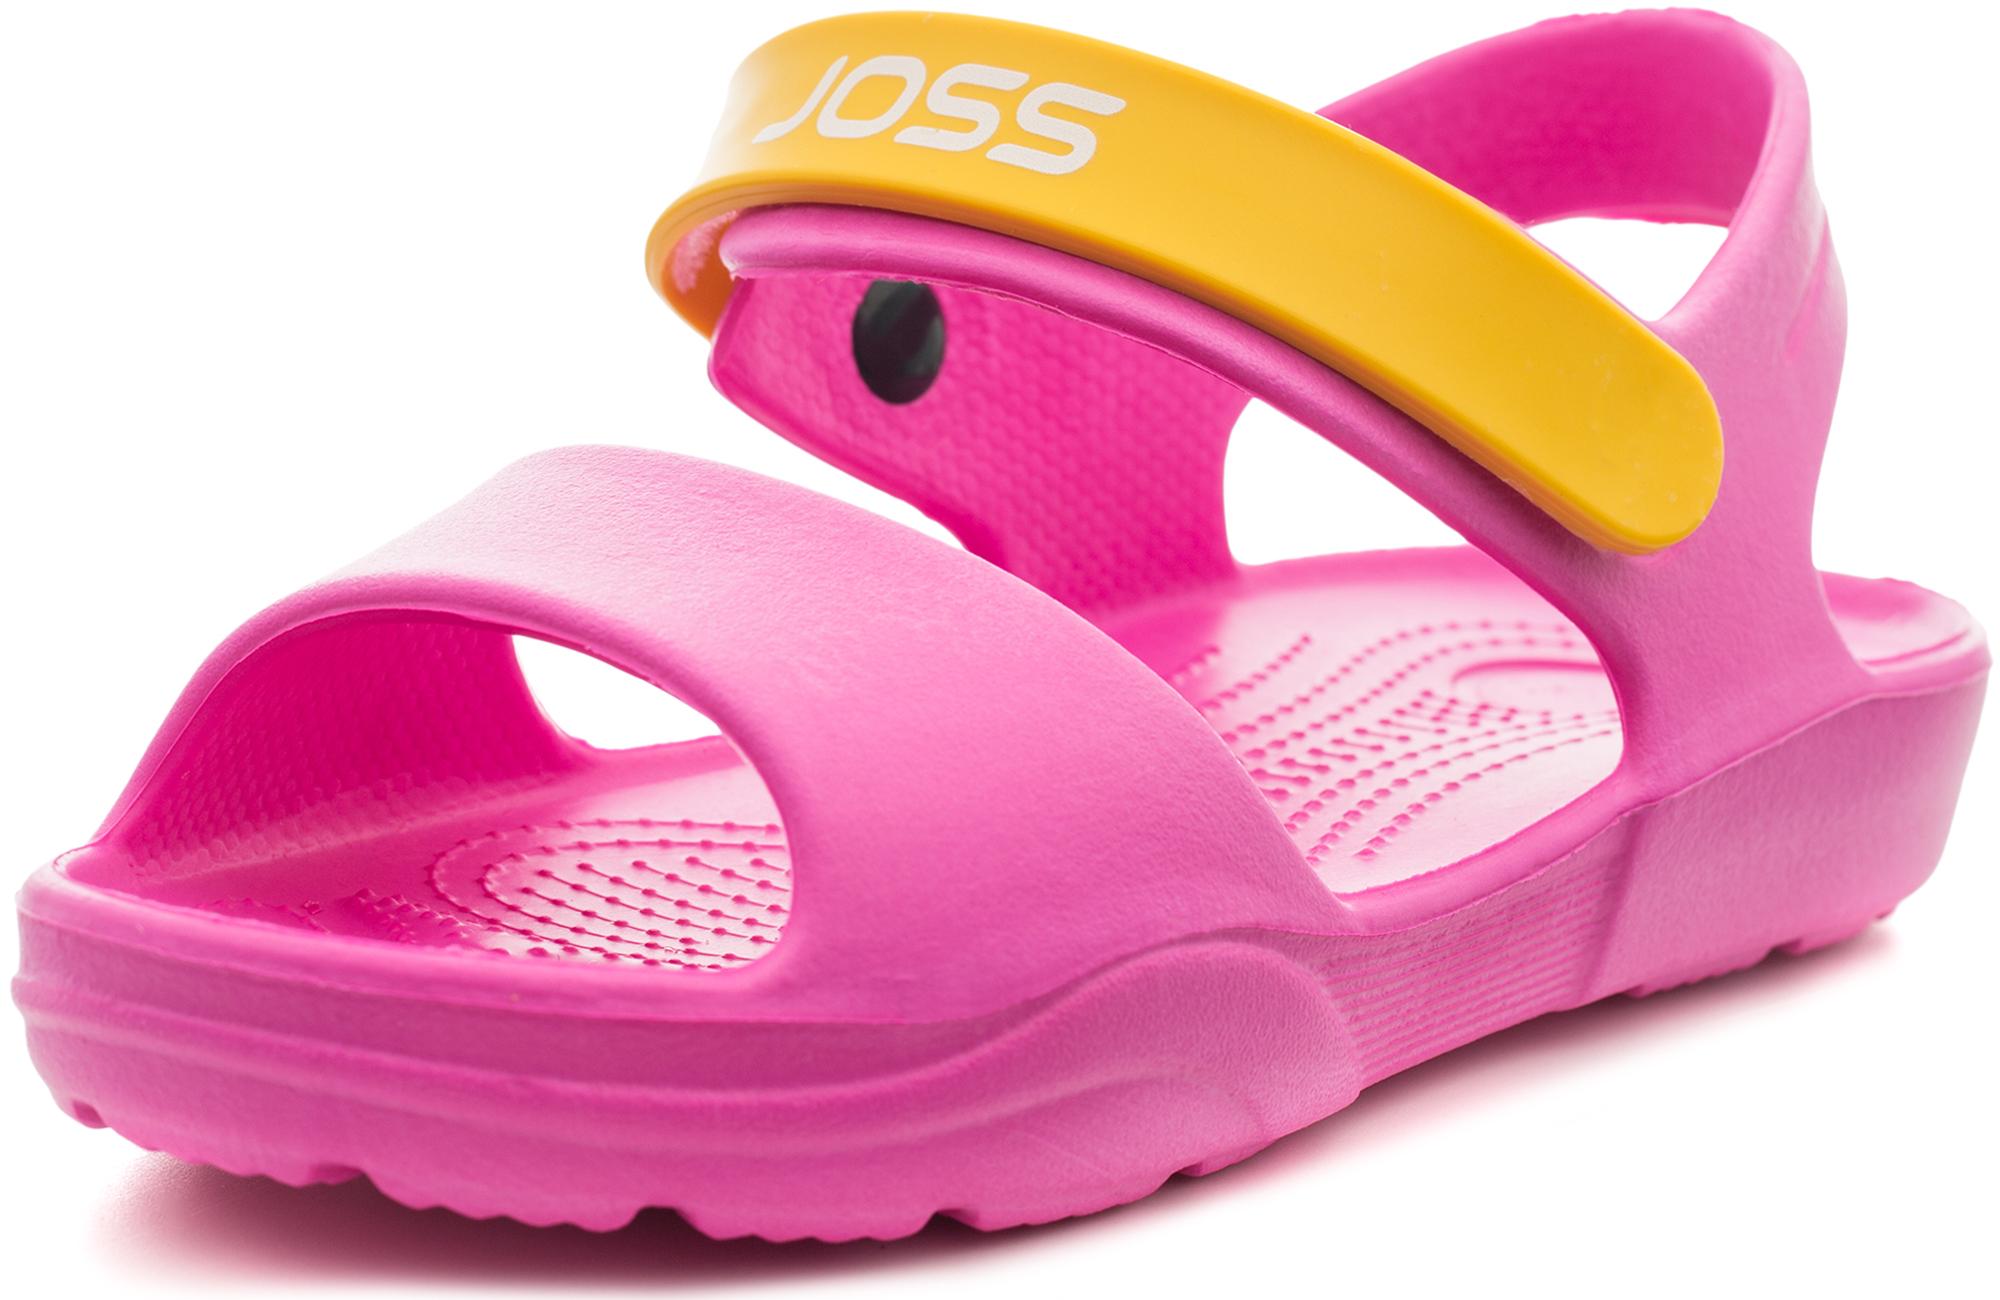 Joss Шлепанцы для девочек G-Sand, размер 34-35